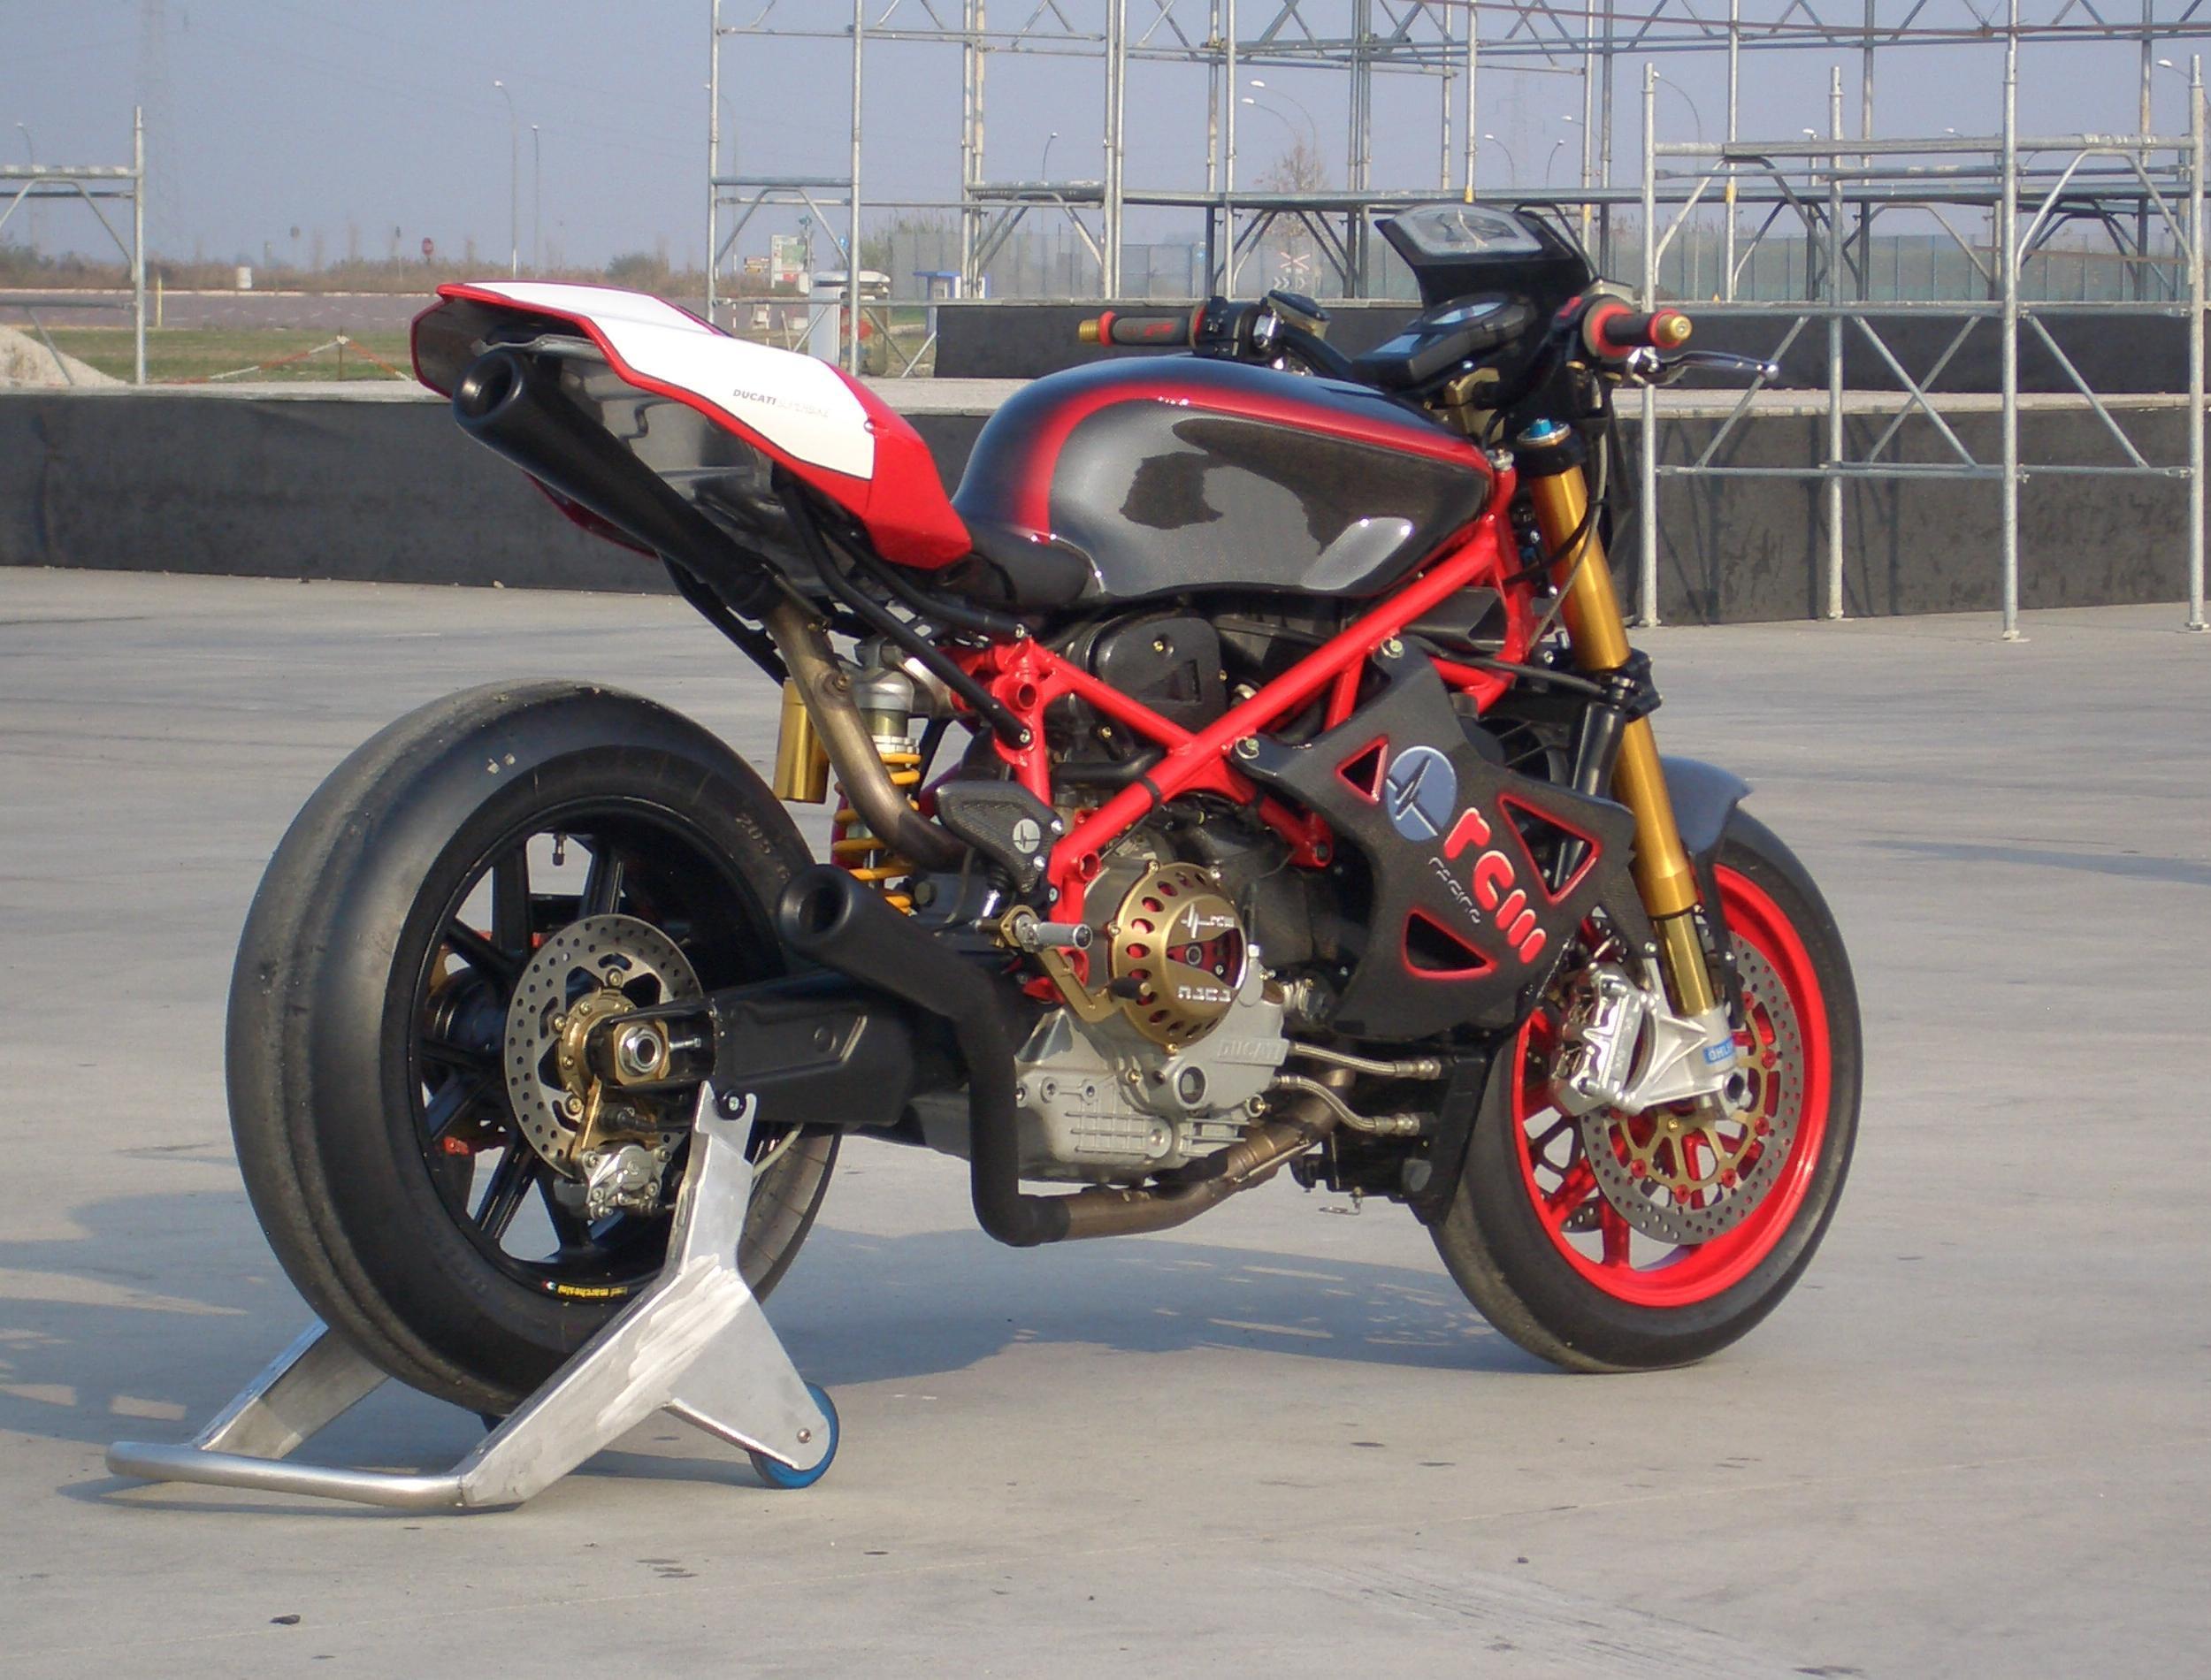 Ducati Superbike Owners